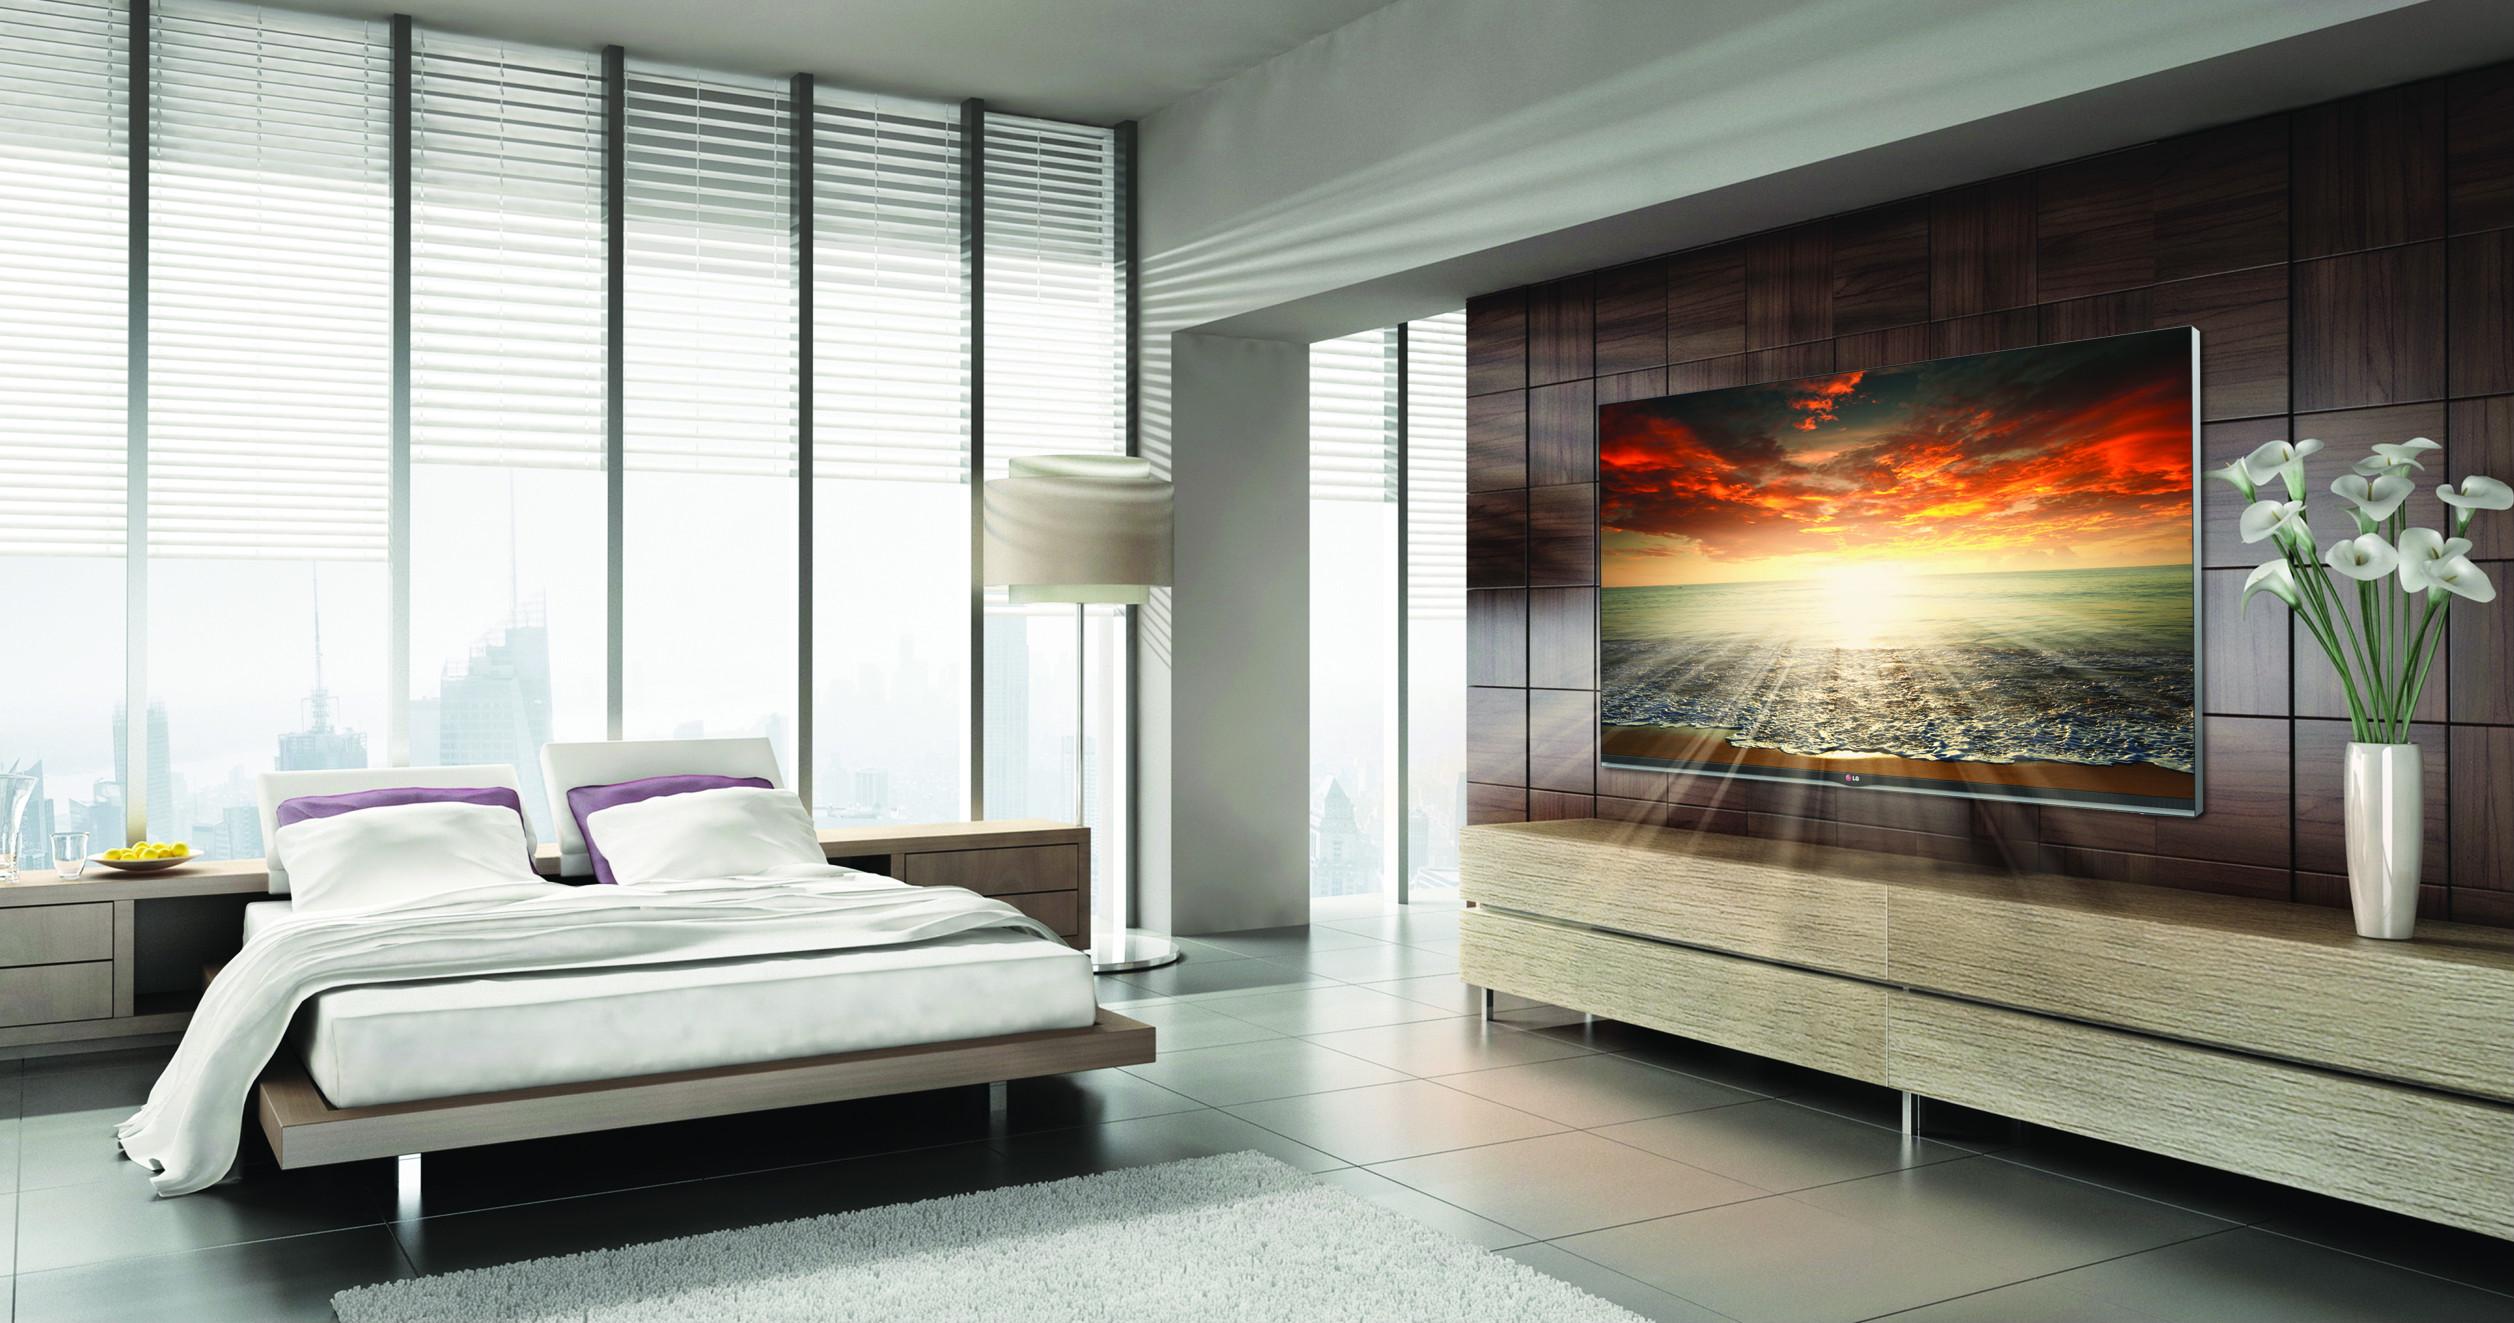 LG Televisions